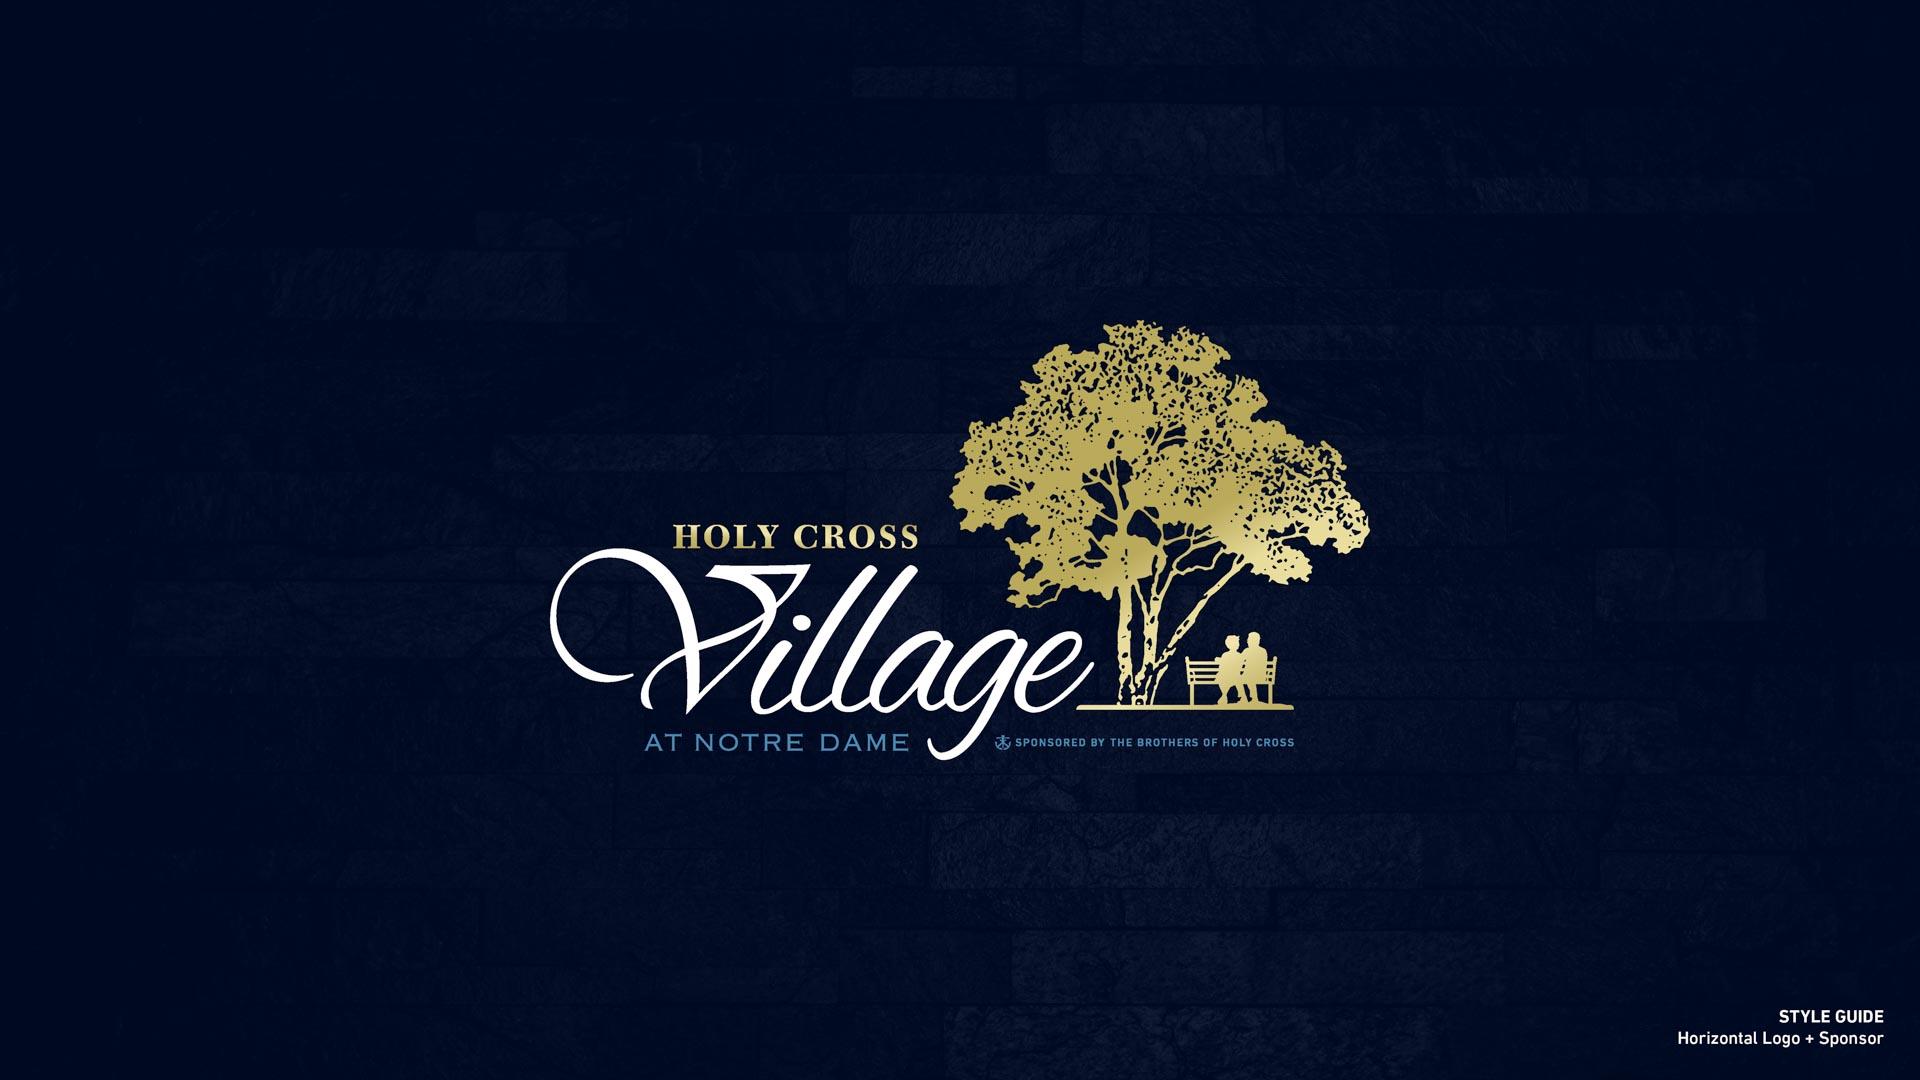 Holy Cross Village's Horizontal Logo + Sponsor